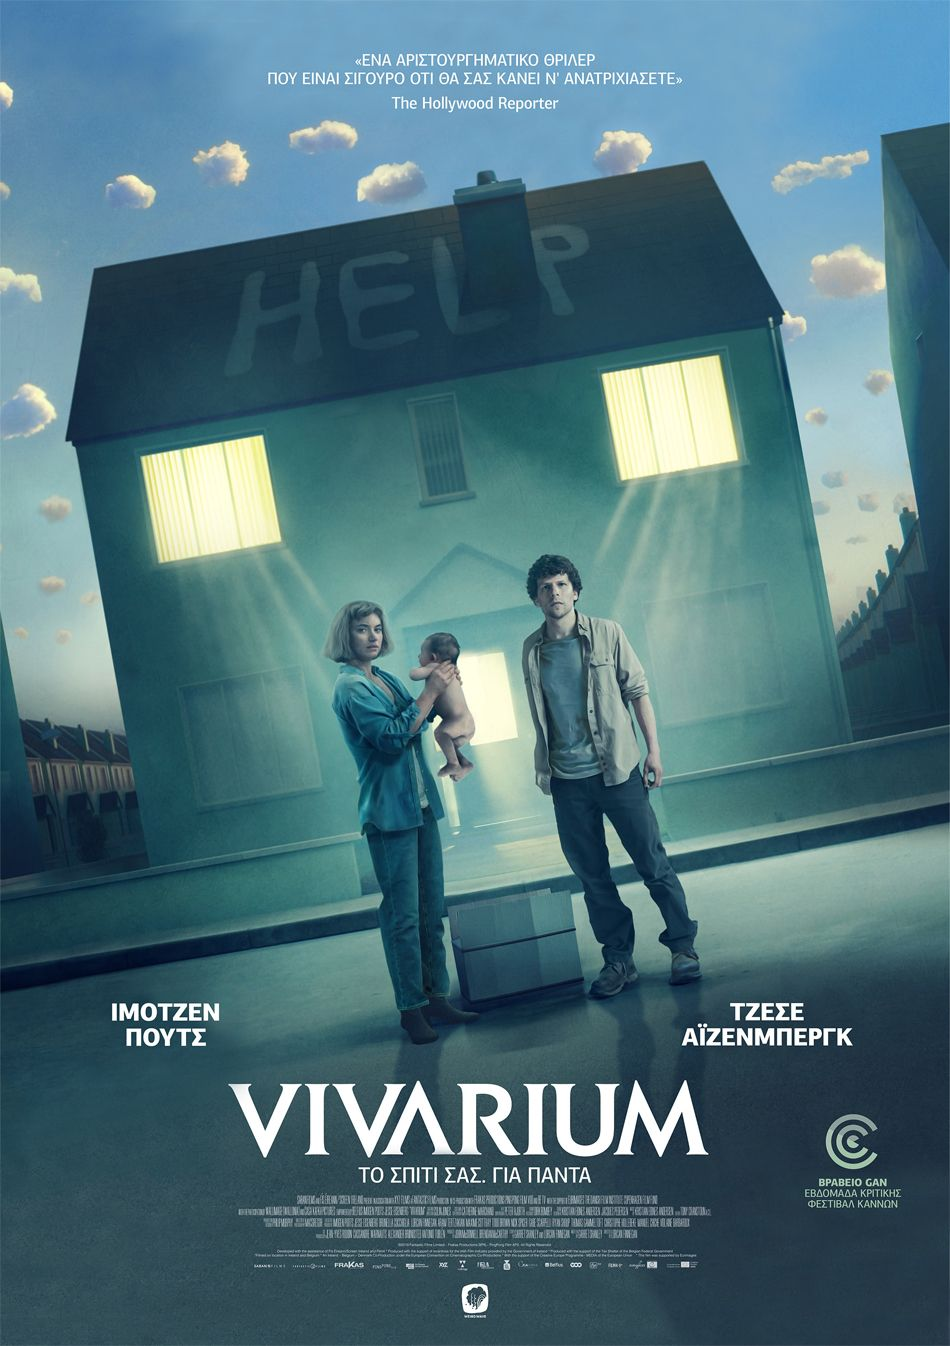 Vivarium Poster Πόστερ